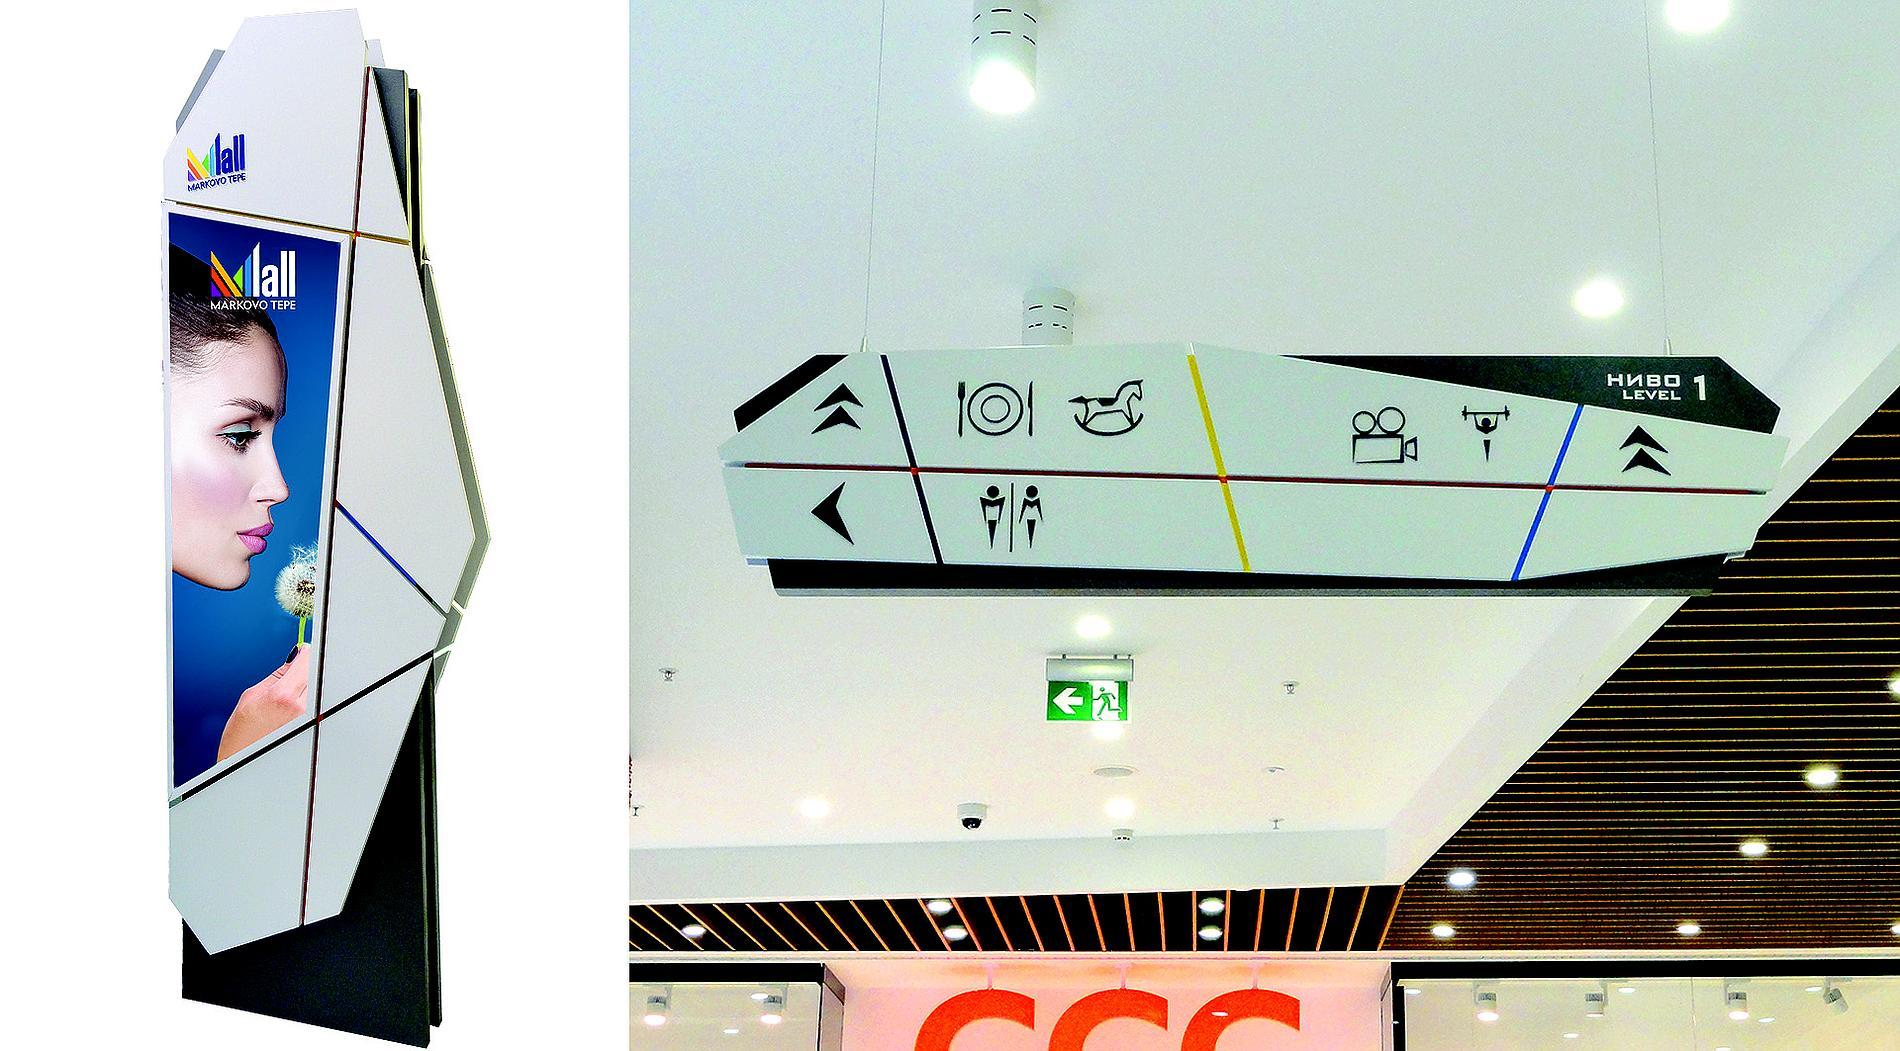 Mall Markovo Tepe - interior signage and wayfinding signs